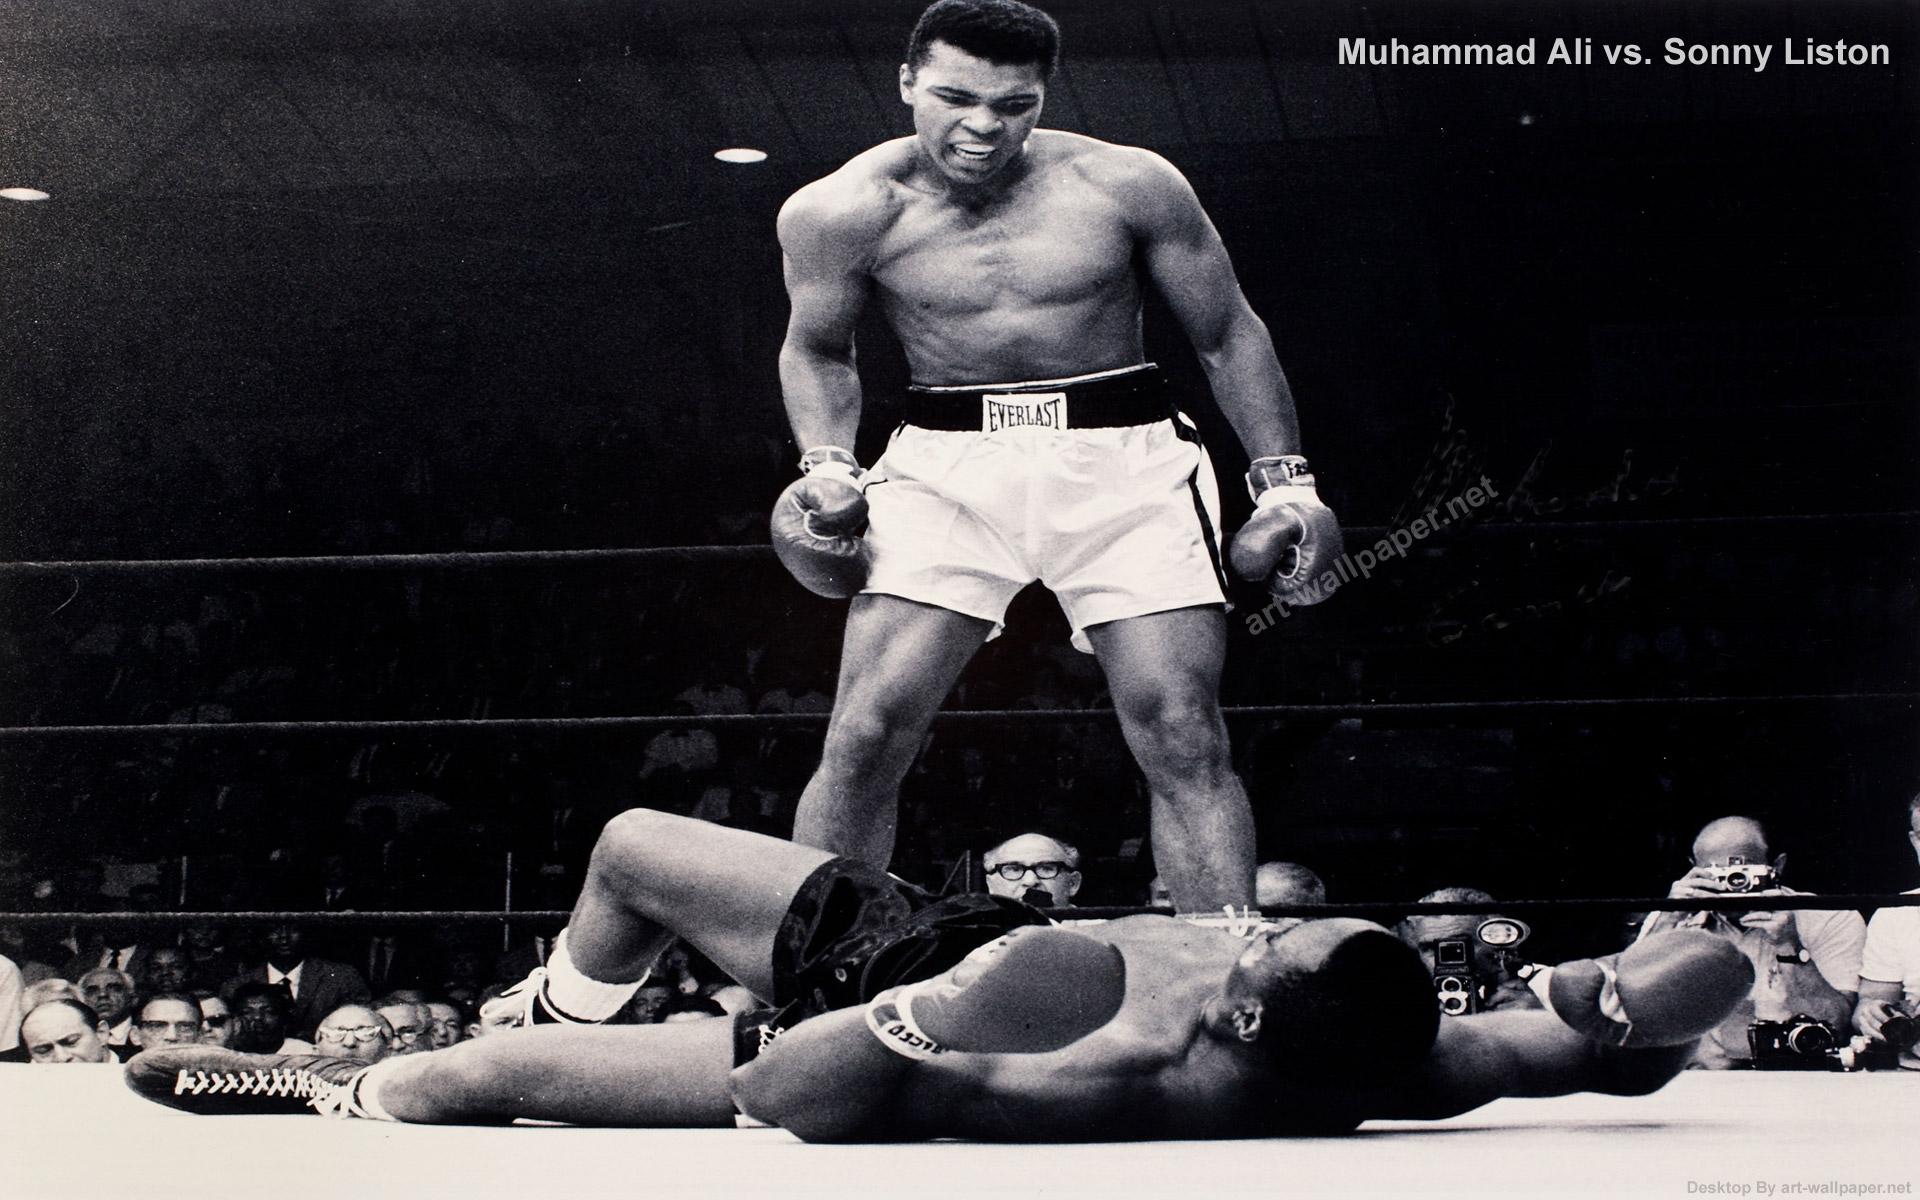 Download Muhammad Ali Full Hd Desktop Wallpaper 1920x1080 Short 1920x1200